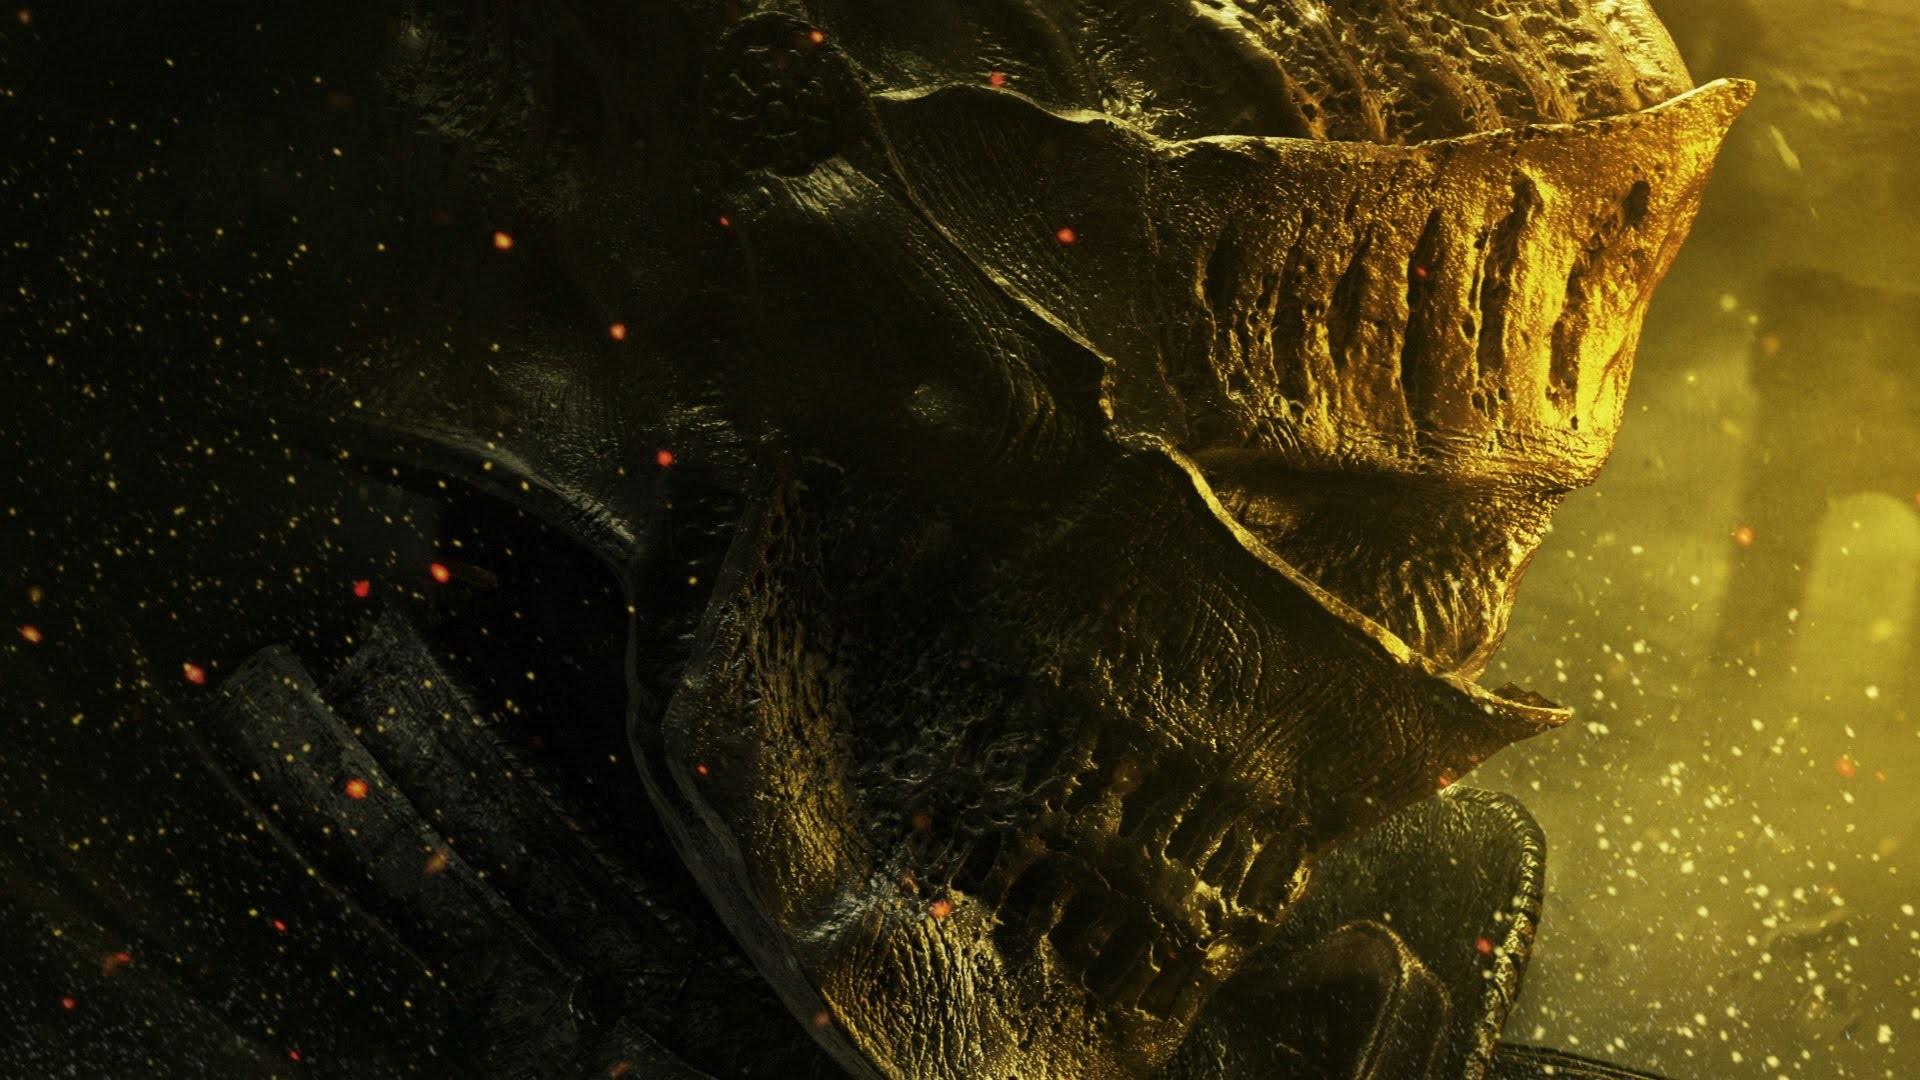 Dark Souls III – Wallpaper Full HD – – Knight – Select Game